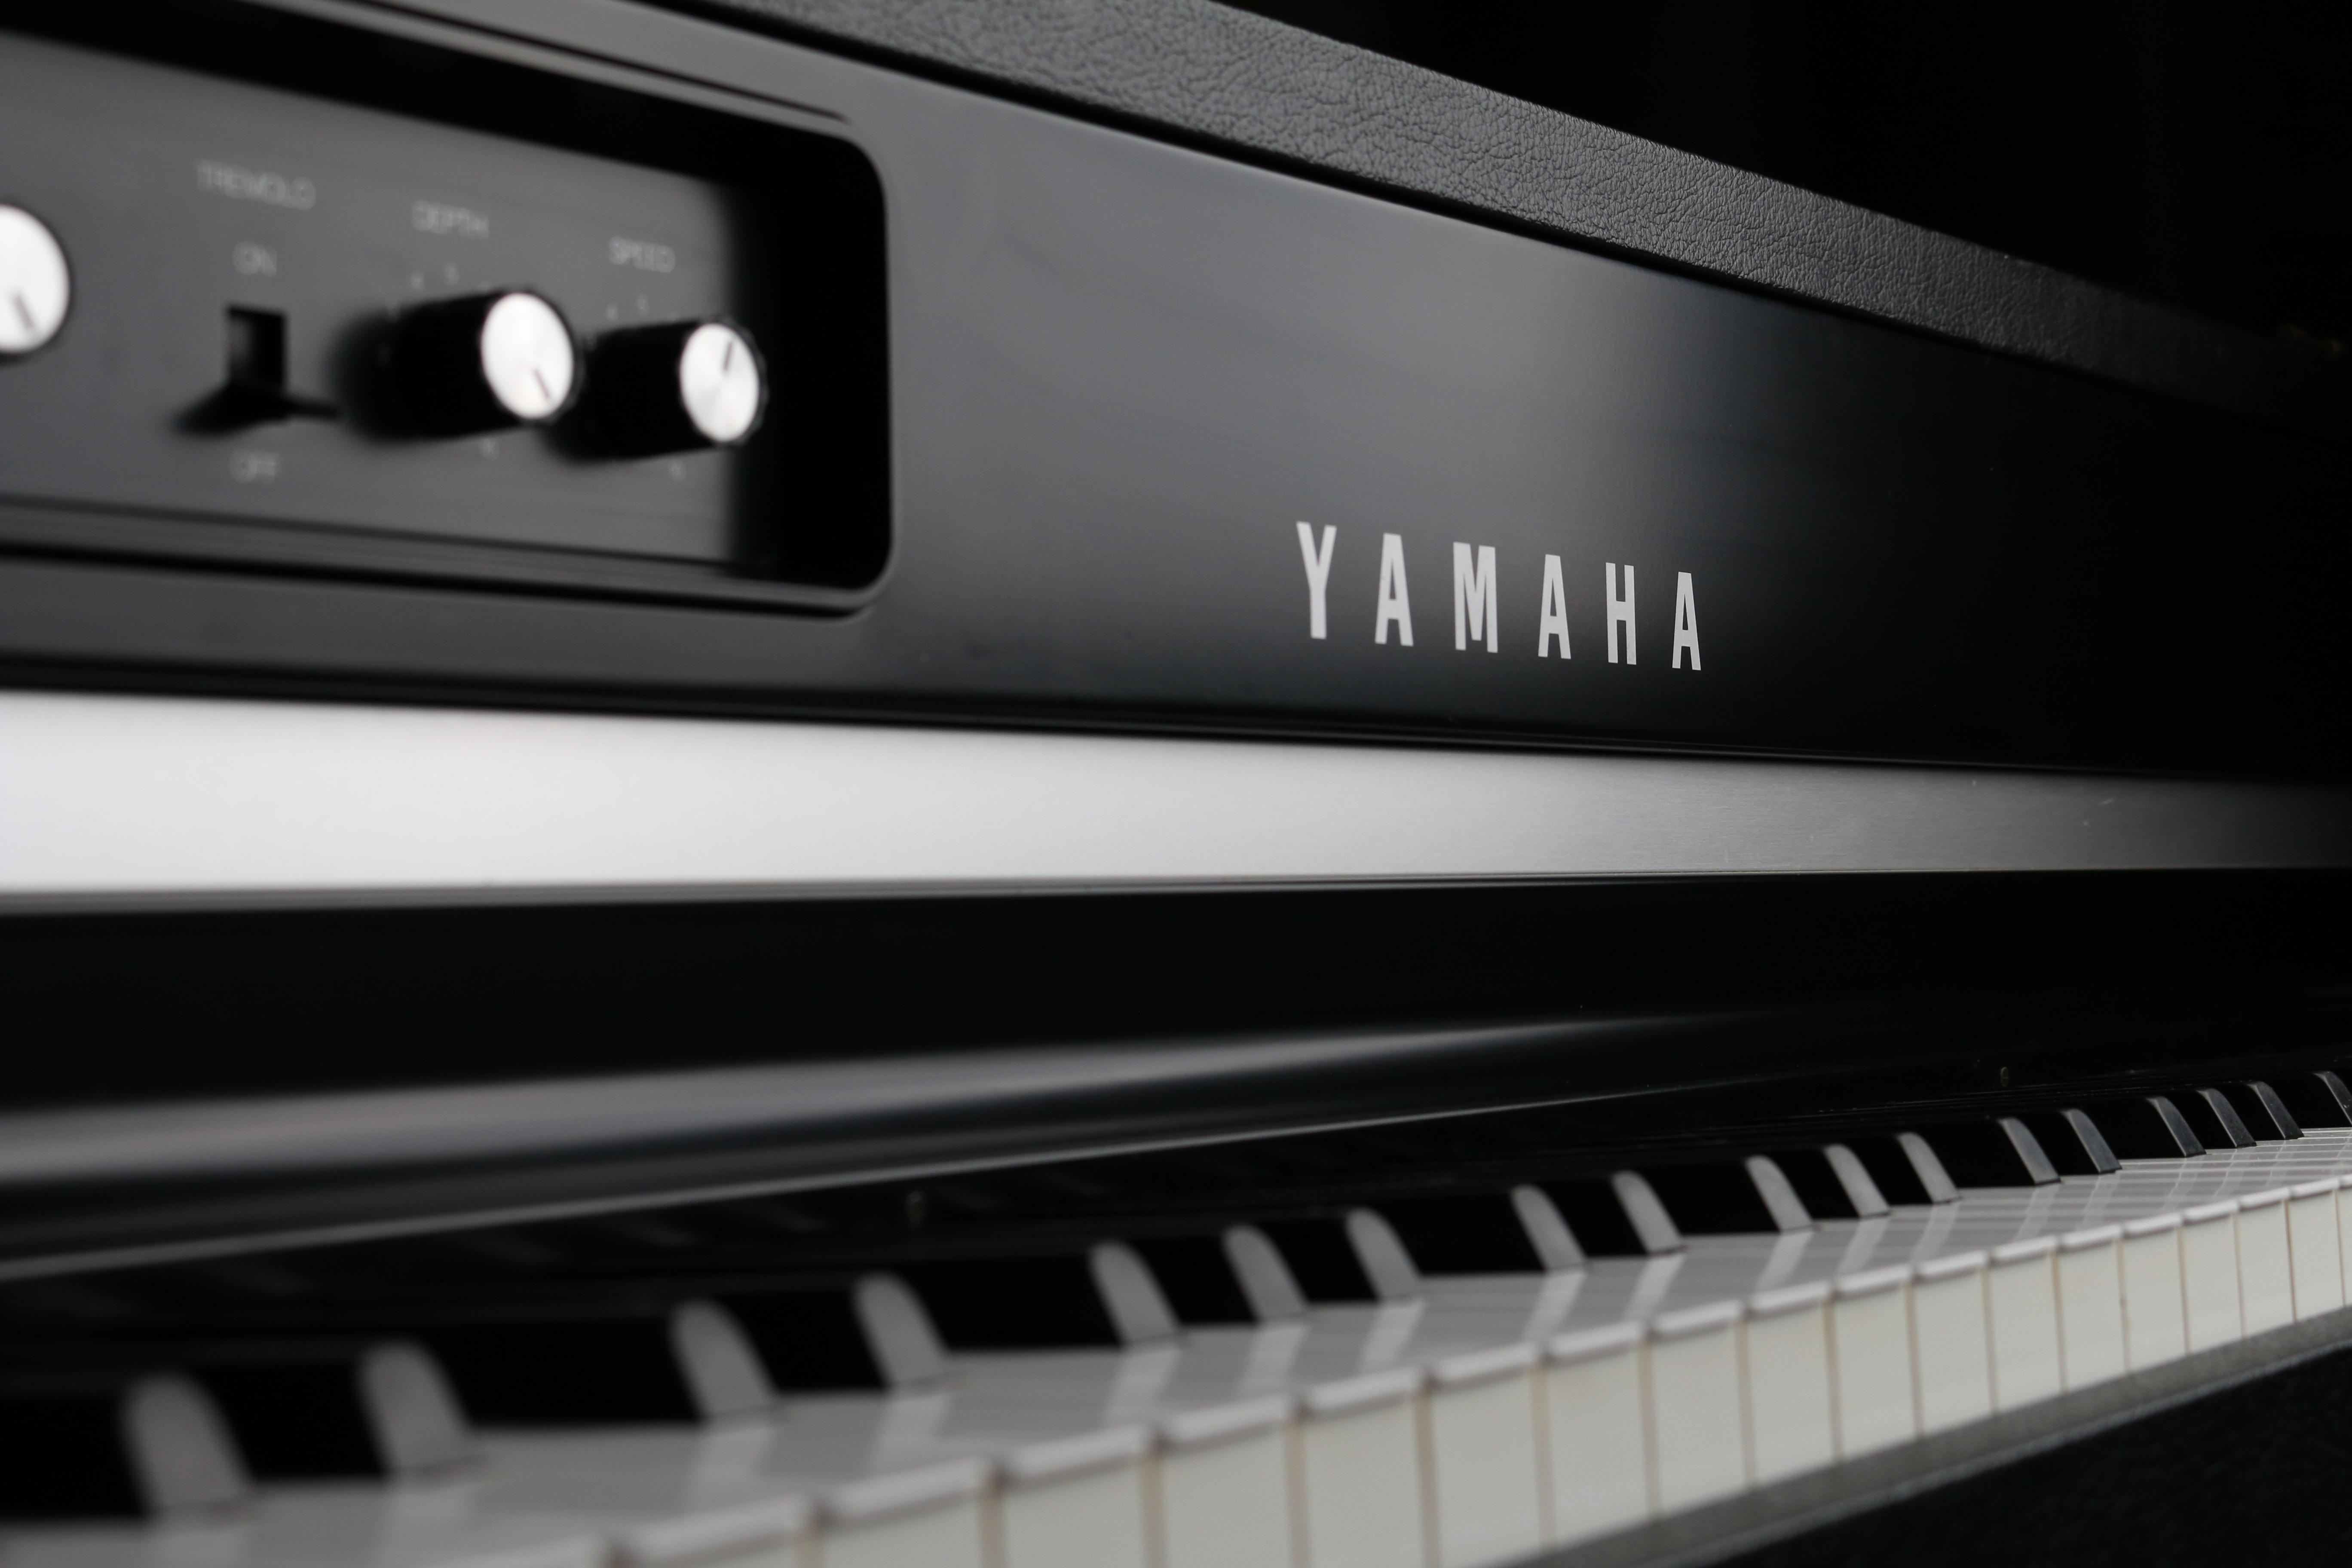 A close-up of a black and white Yamaha keyboard